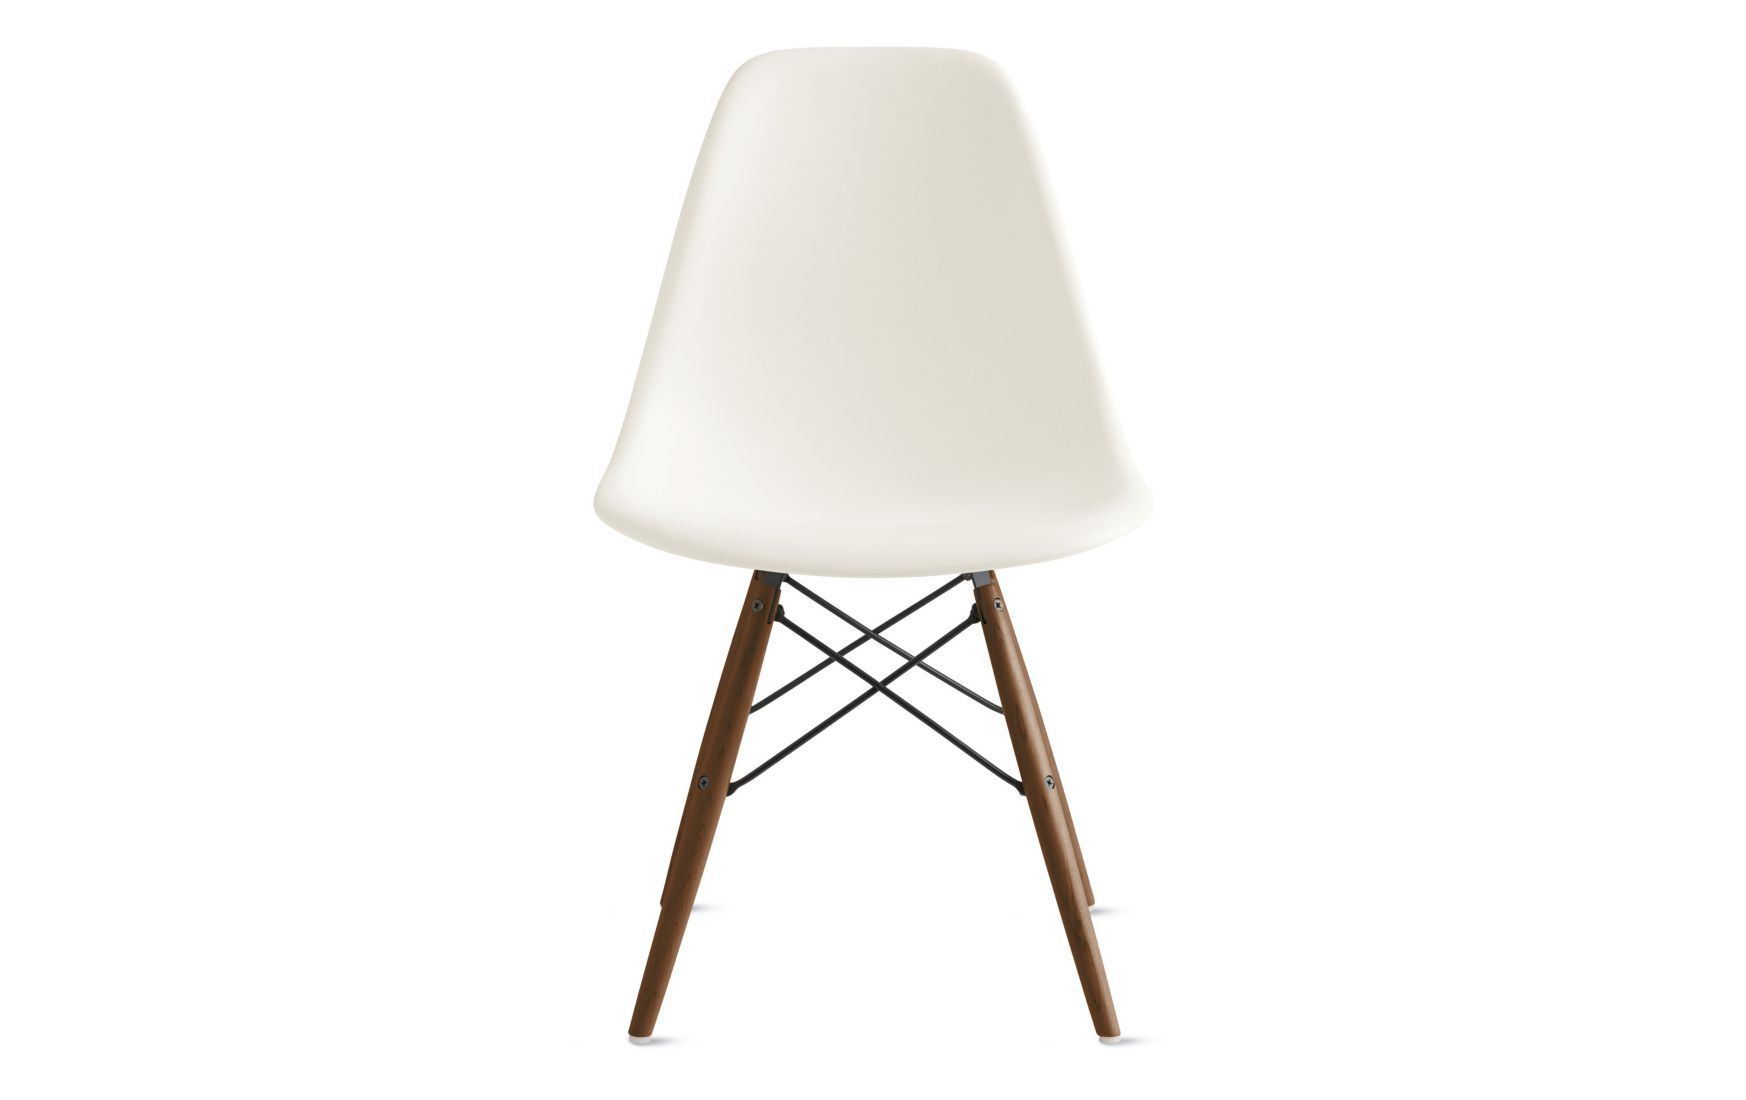 Molded Plastic Dowel-Leg Side Chair